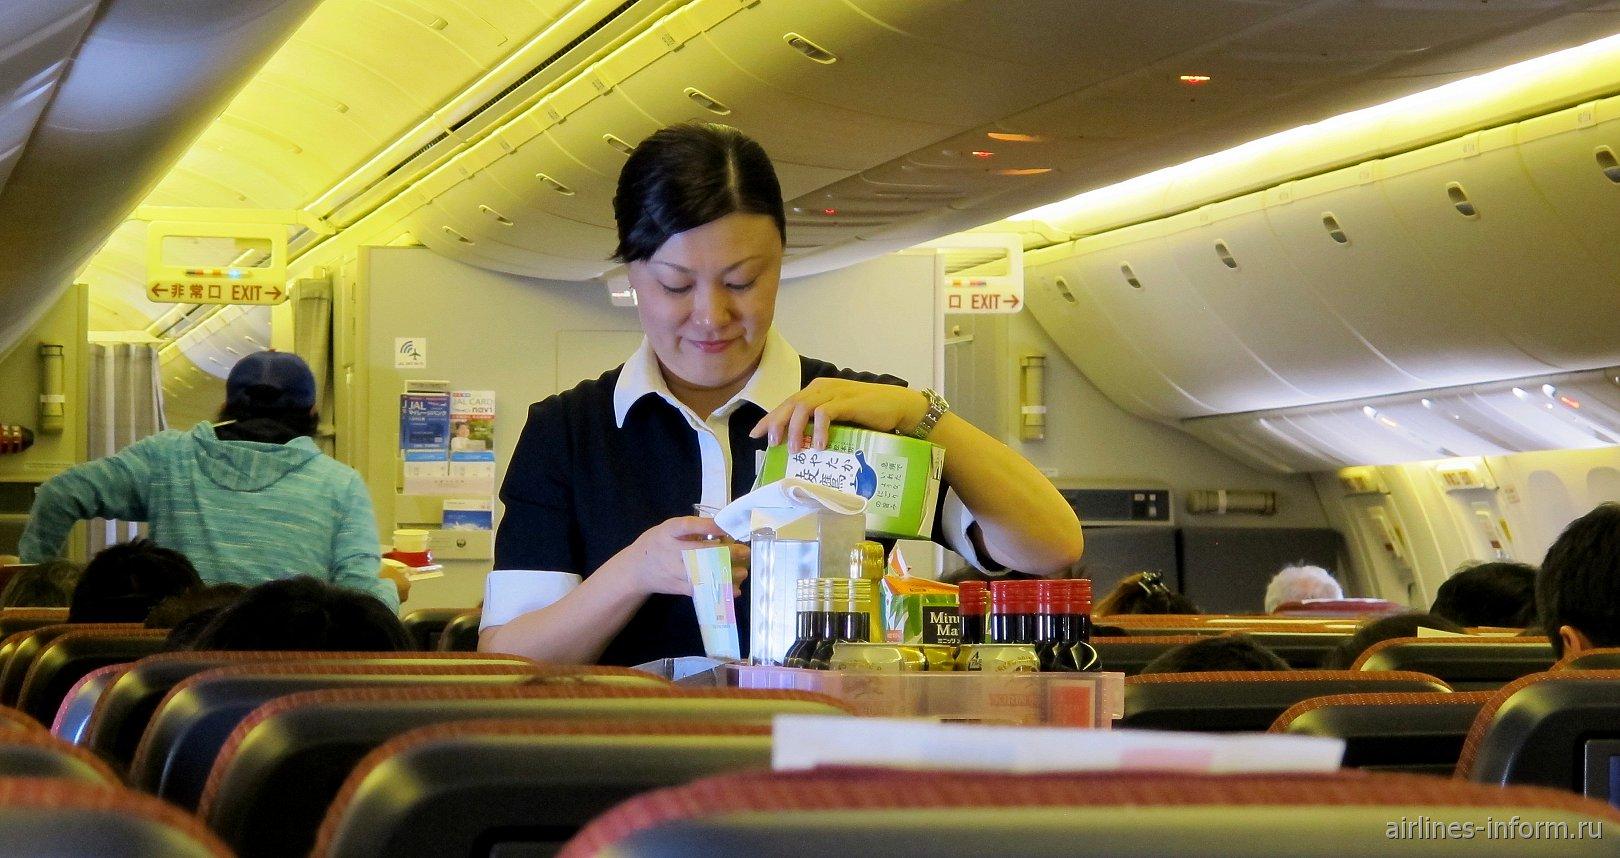 Бортпроводница Японских авиалиний за работой